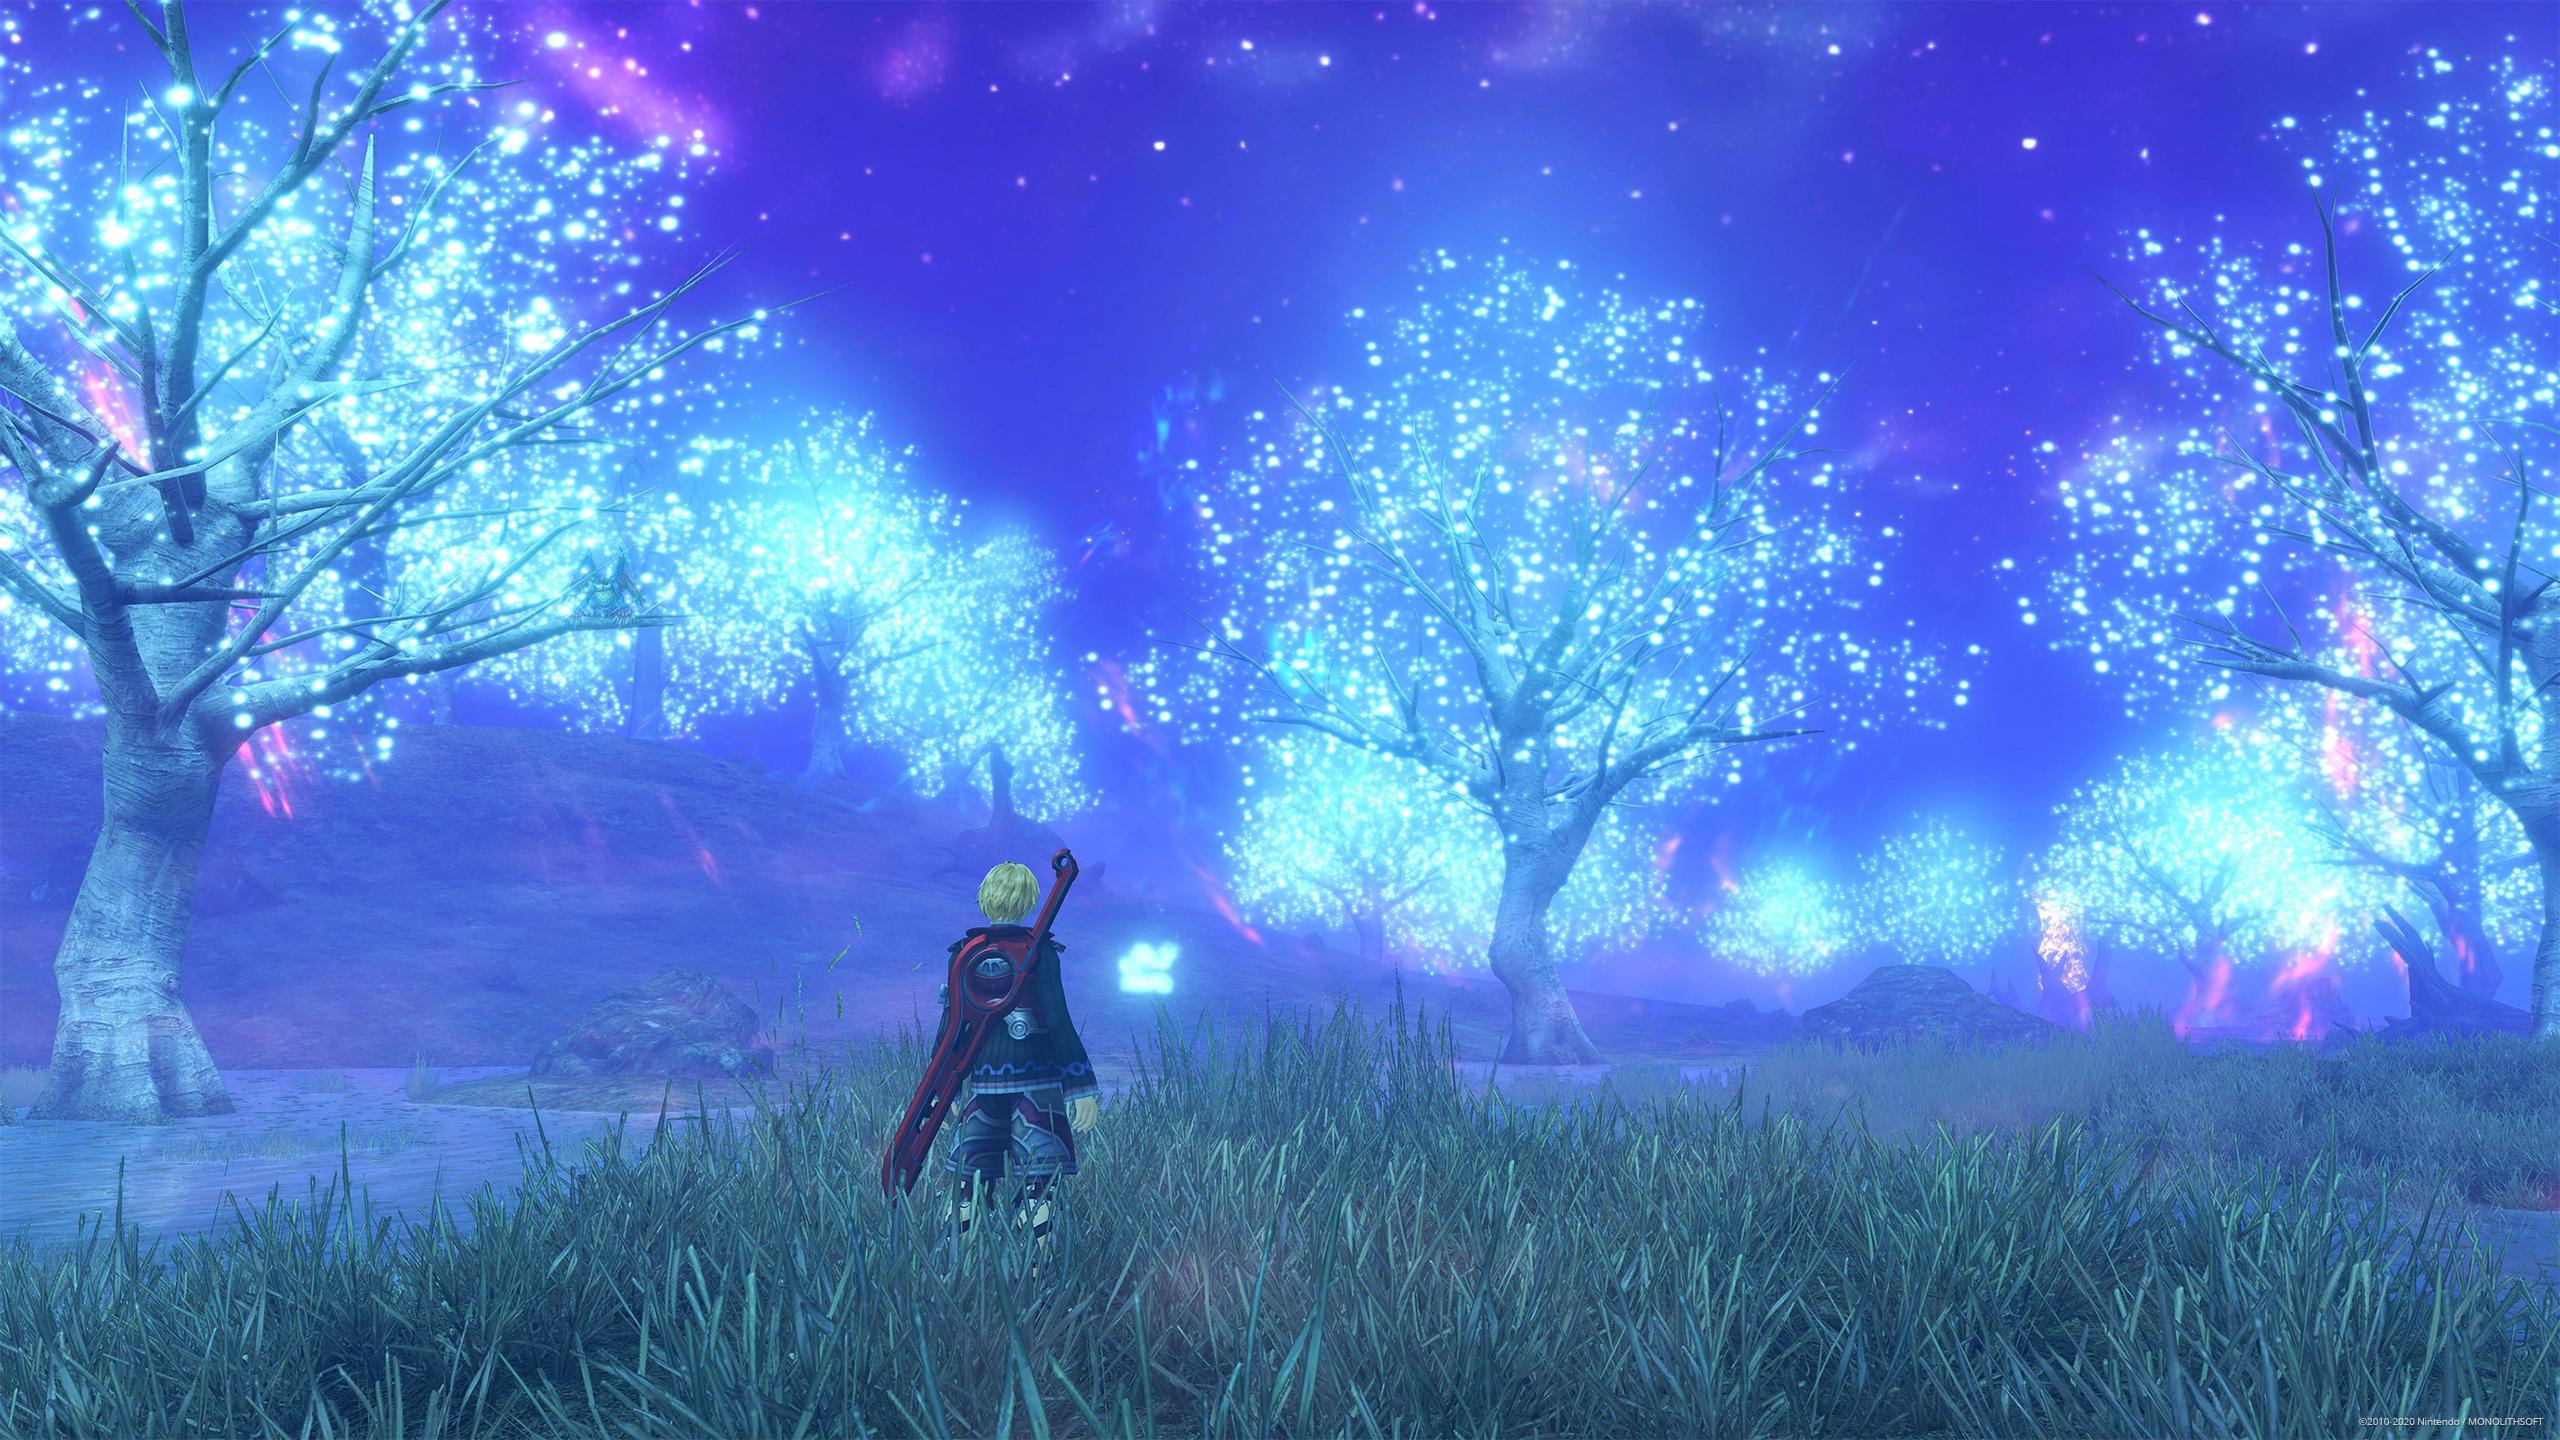 Europe Free Xenoblade Chronicles De Wallpapers Now Available Via My Nintendo My Nintendo News